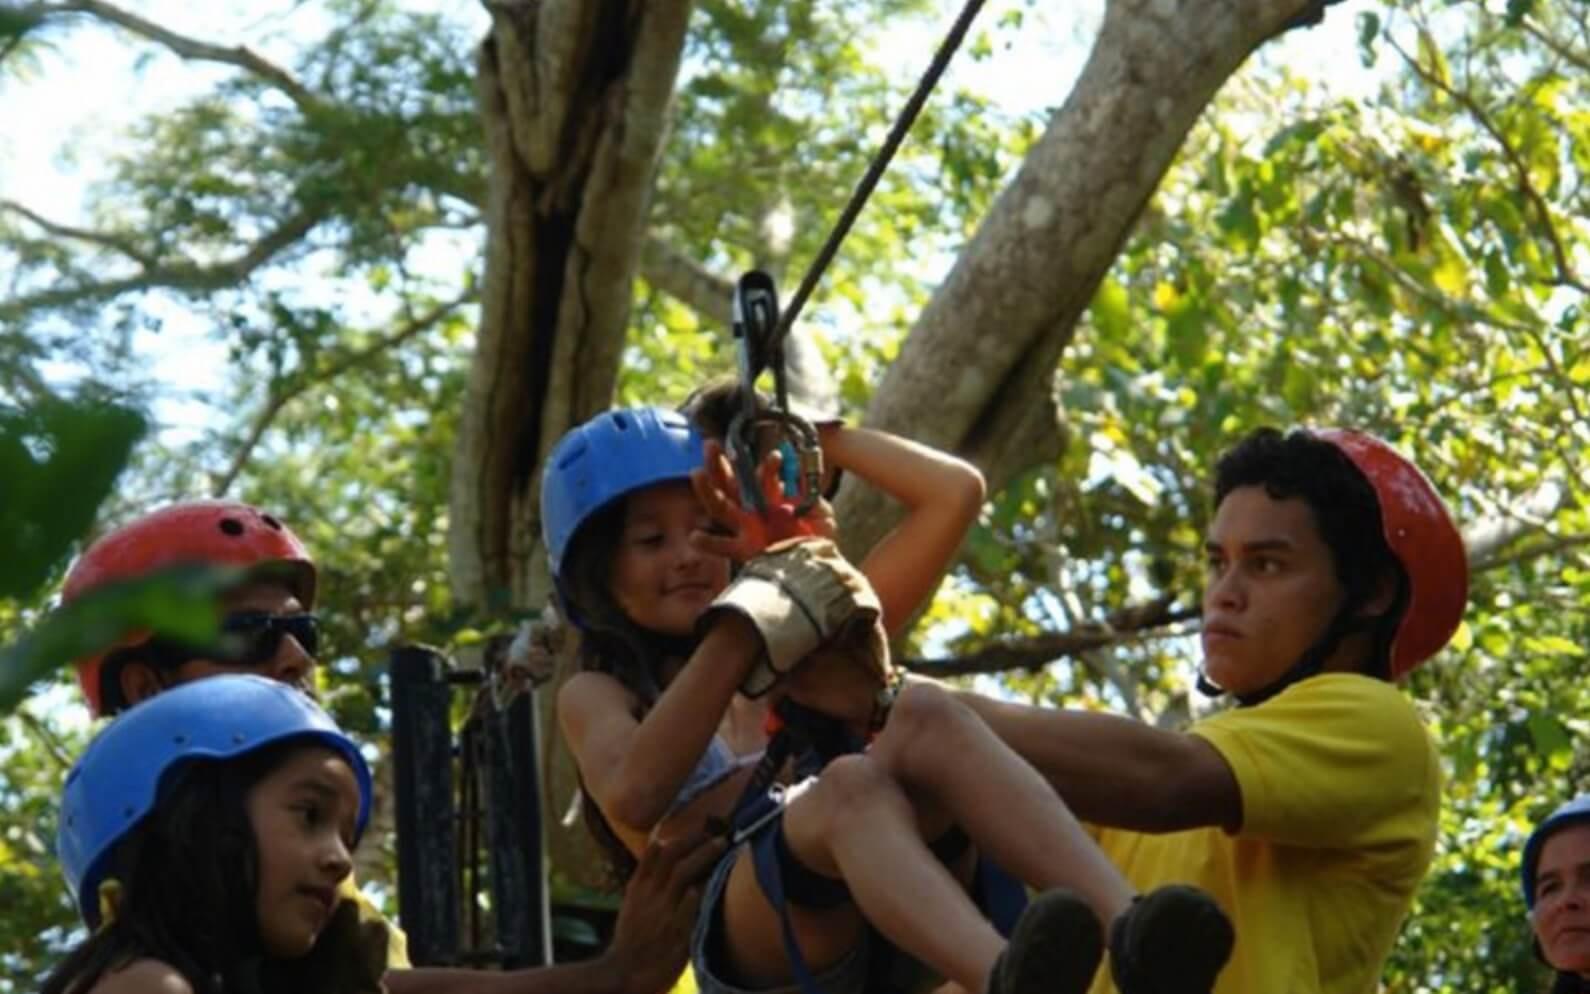 Tamarindo Guanacaste Costa Rica zipline canopy tour guide assisting guests